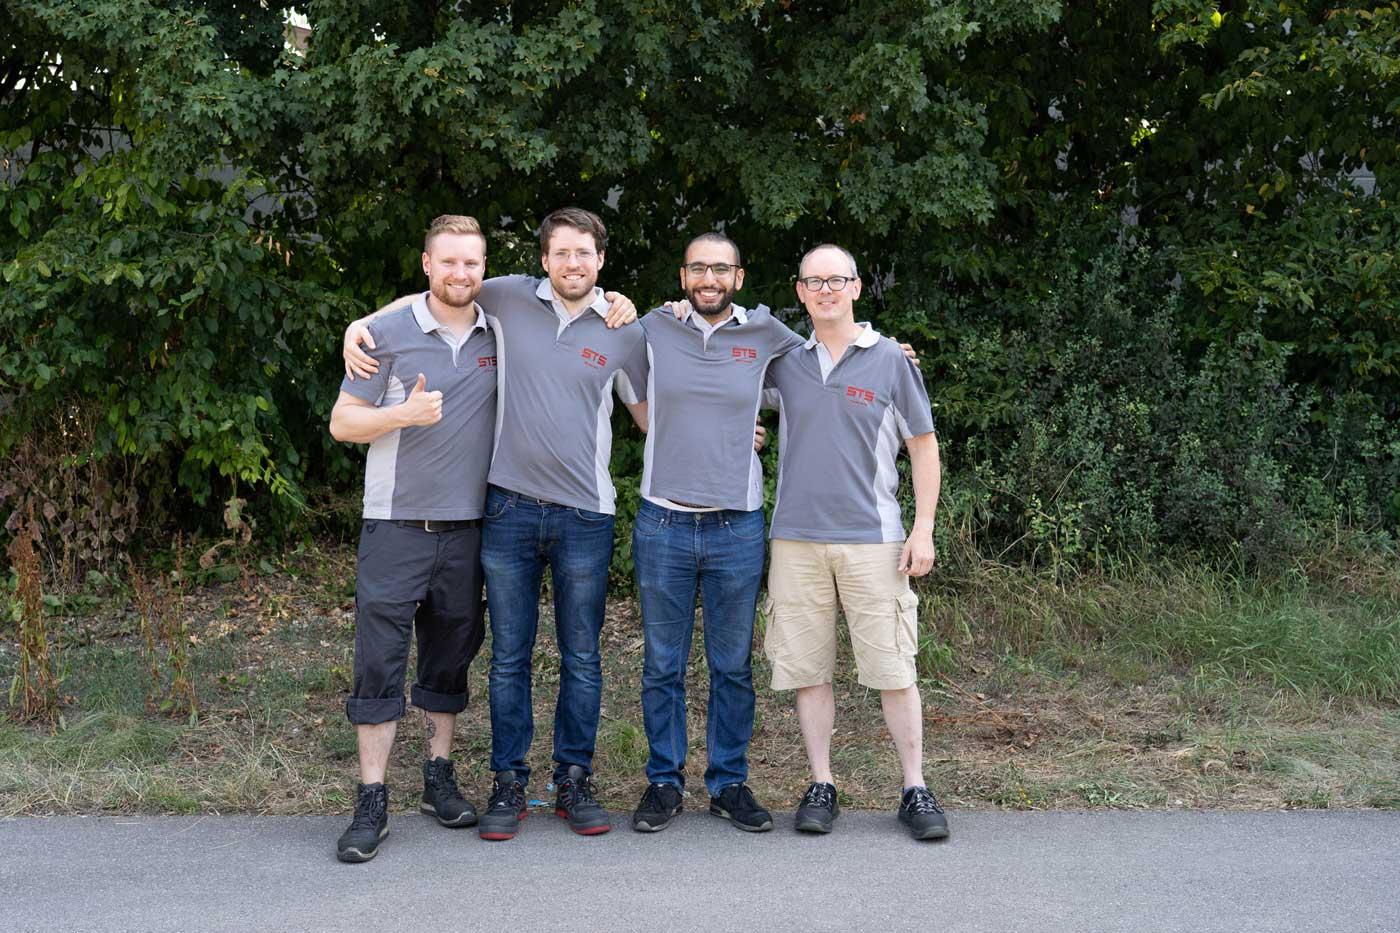 Konstruktion STS Team Experten